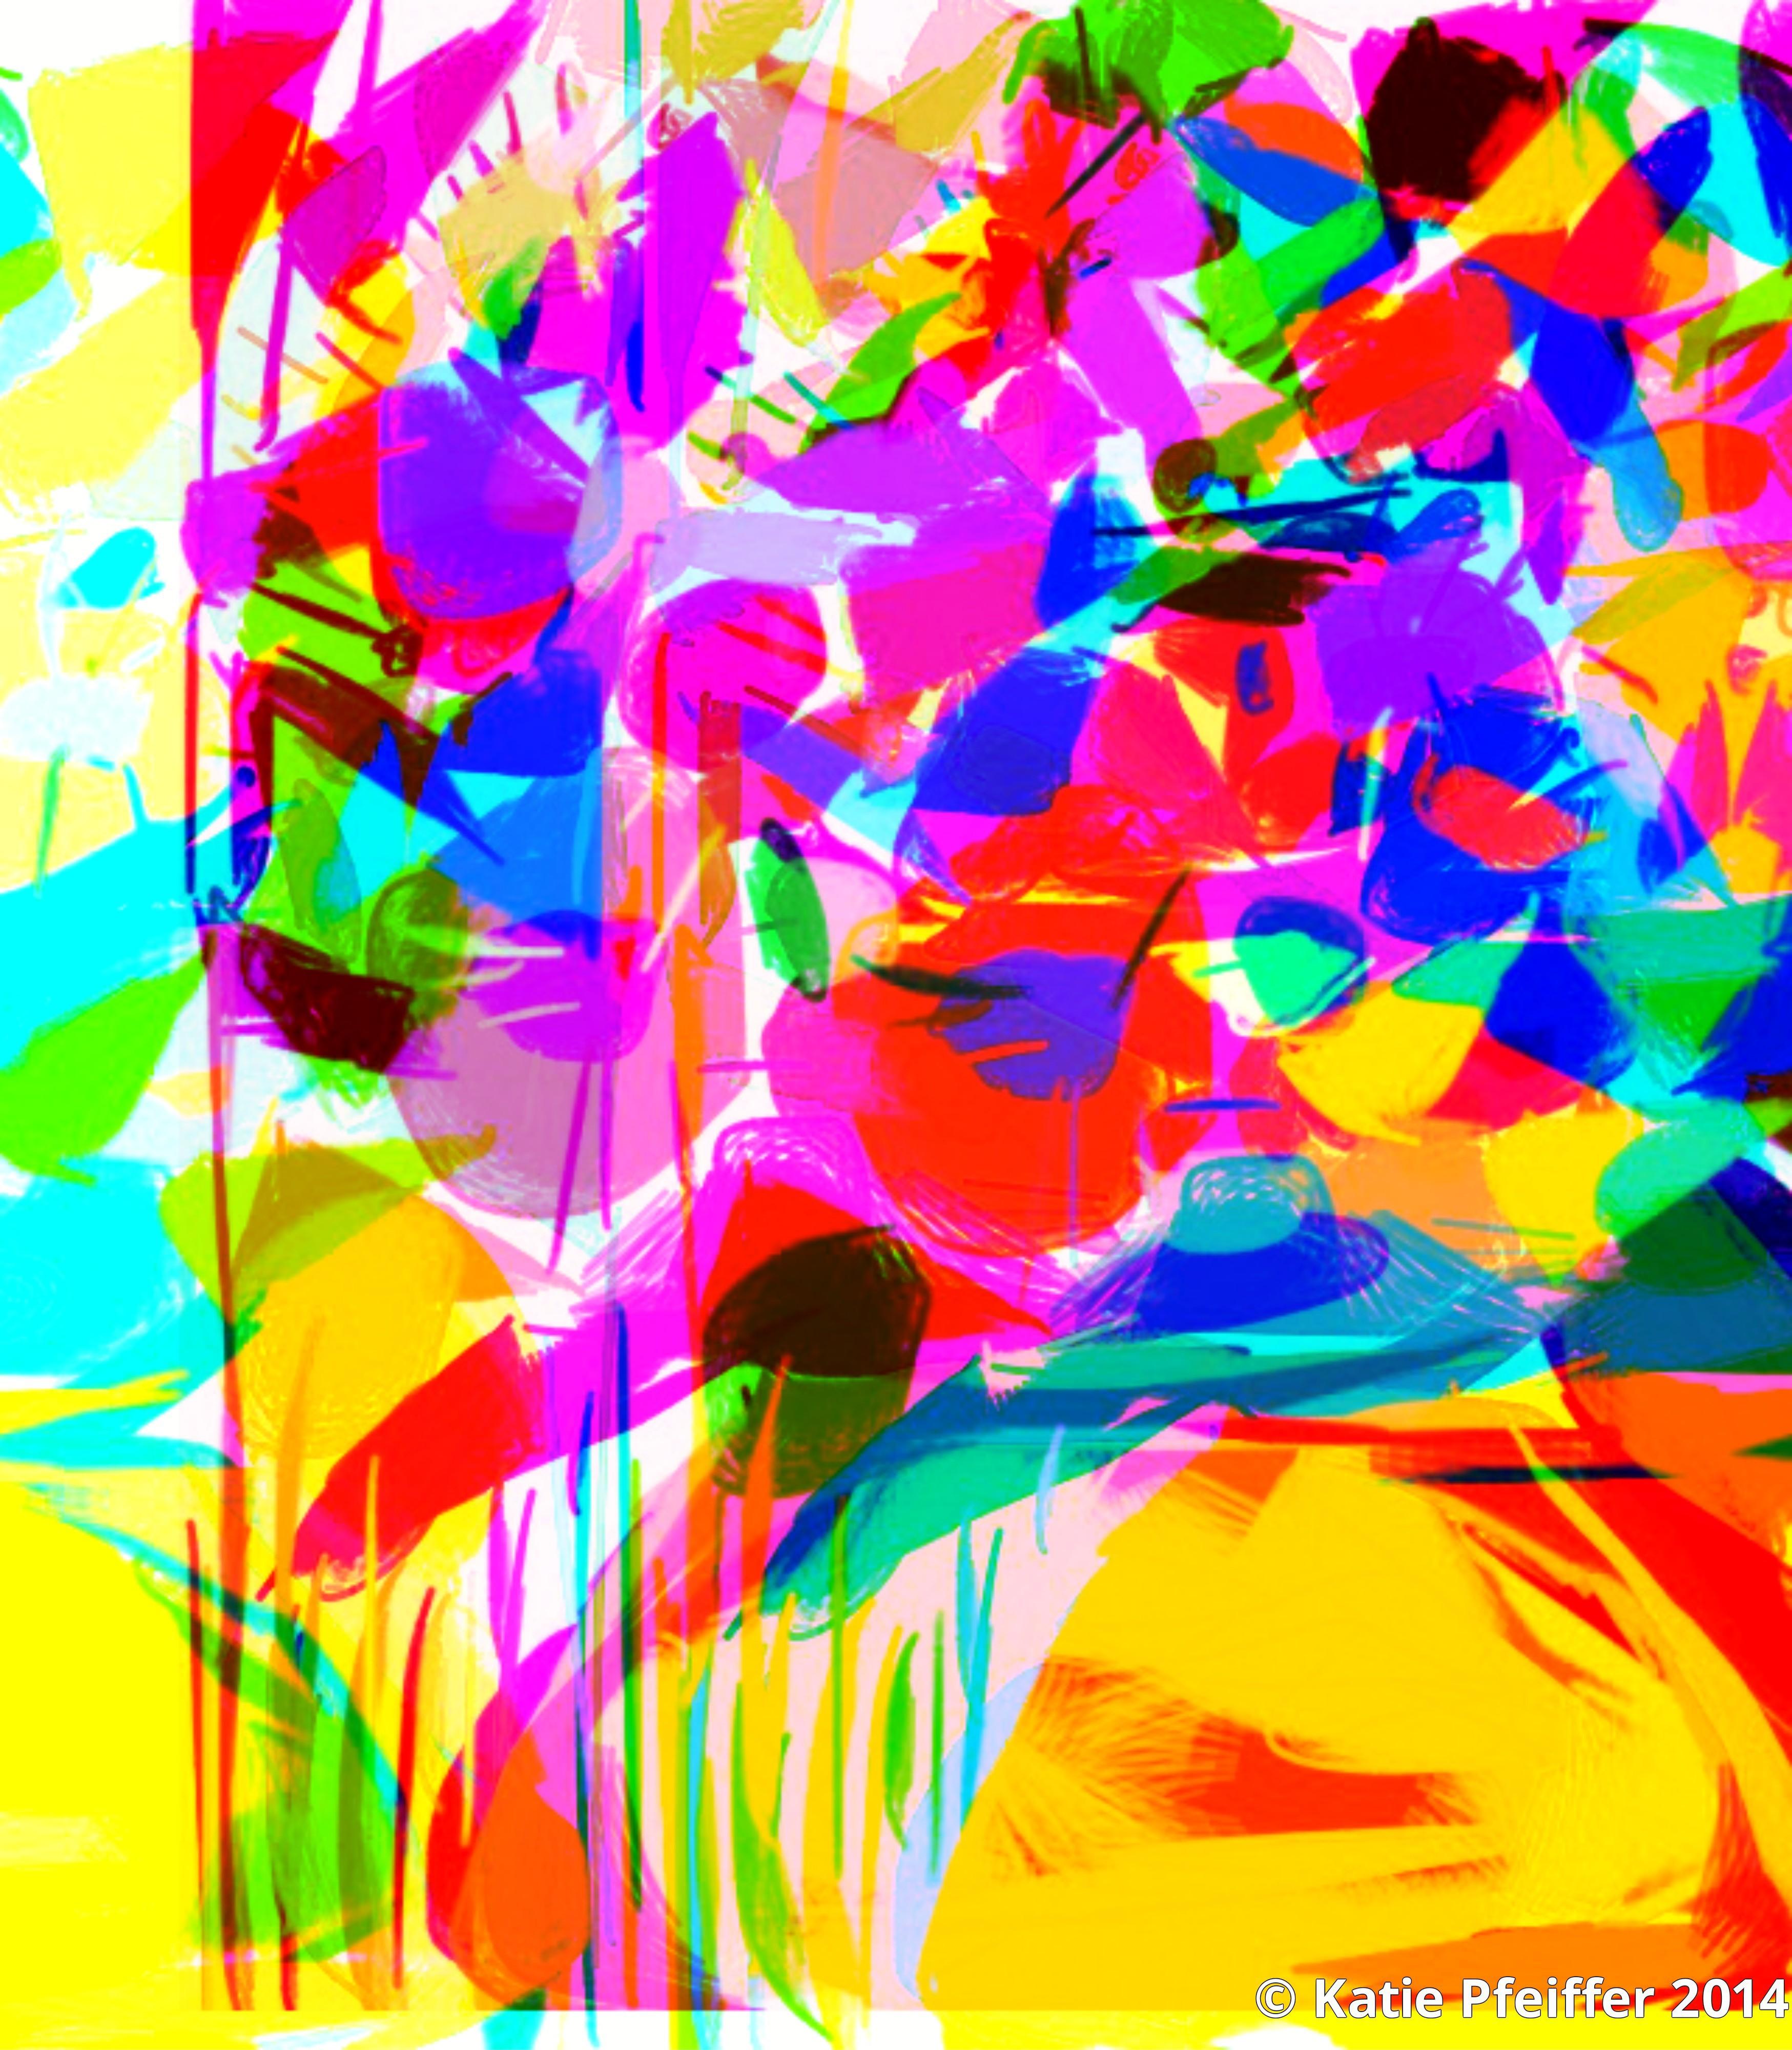 katie pfeiffer artwork  abstract flower bouquet